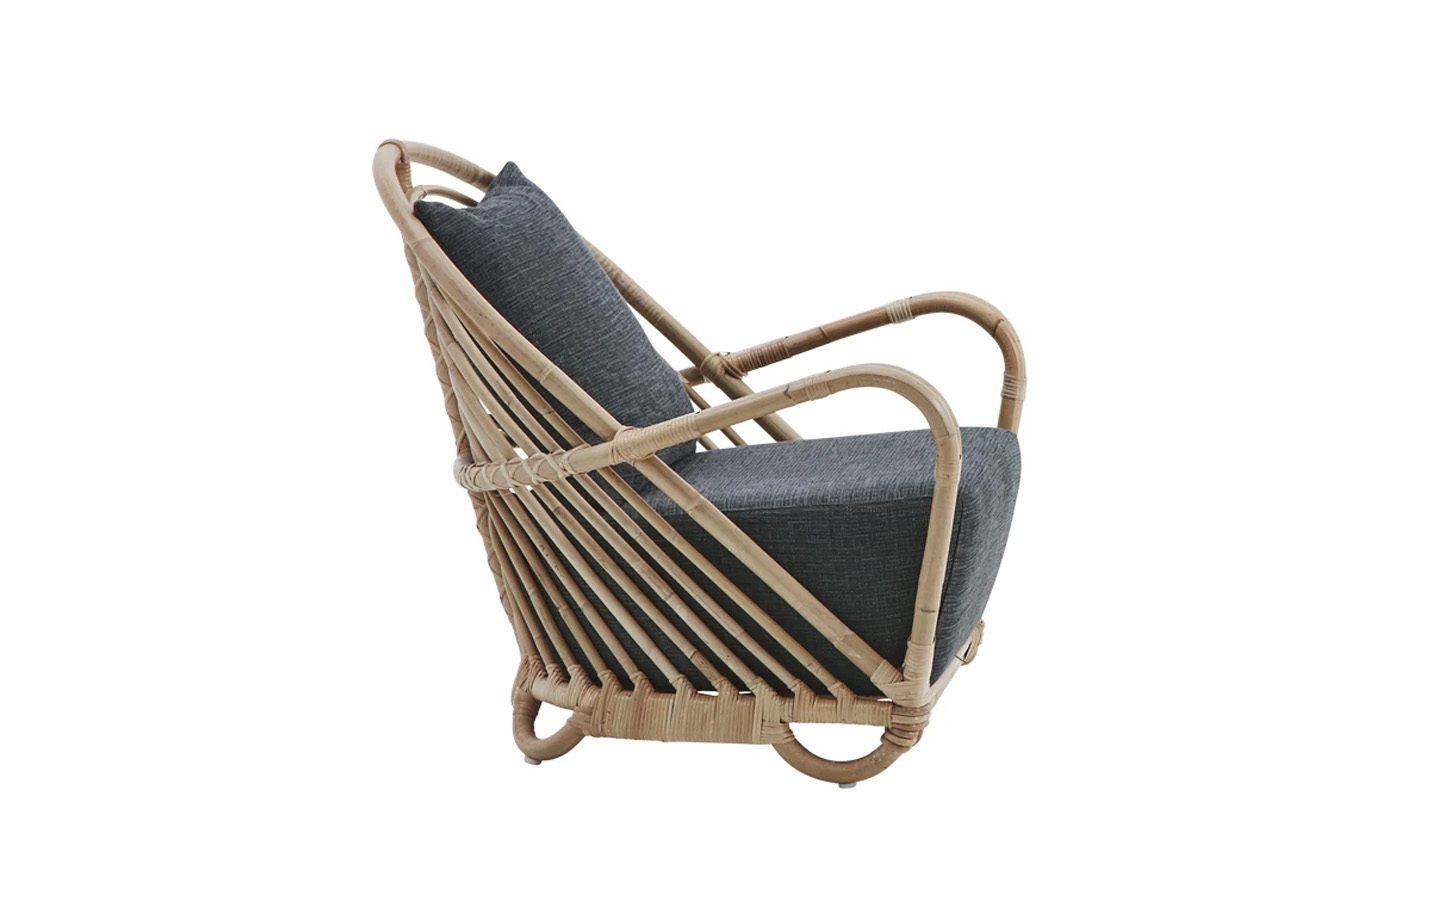 Charlottenborg-Rattan-Lounge-Chair-Interior-fabiia-02